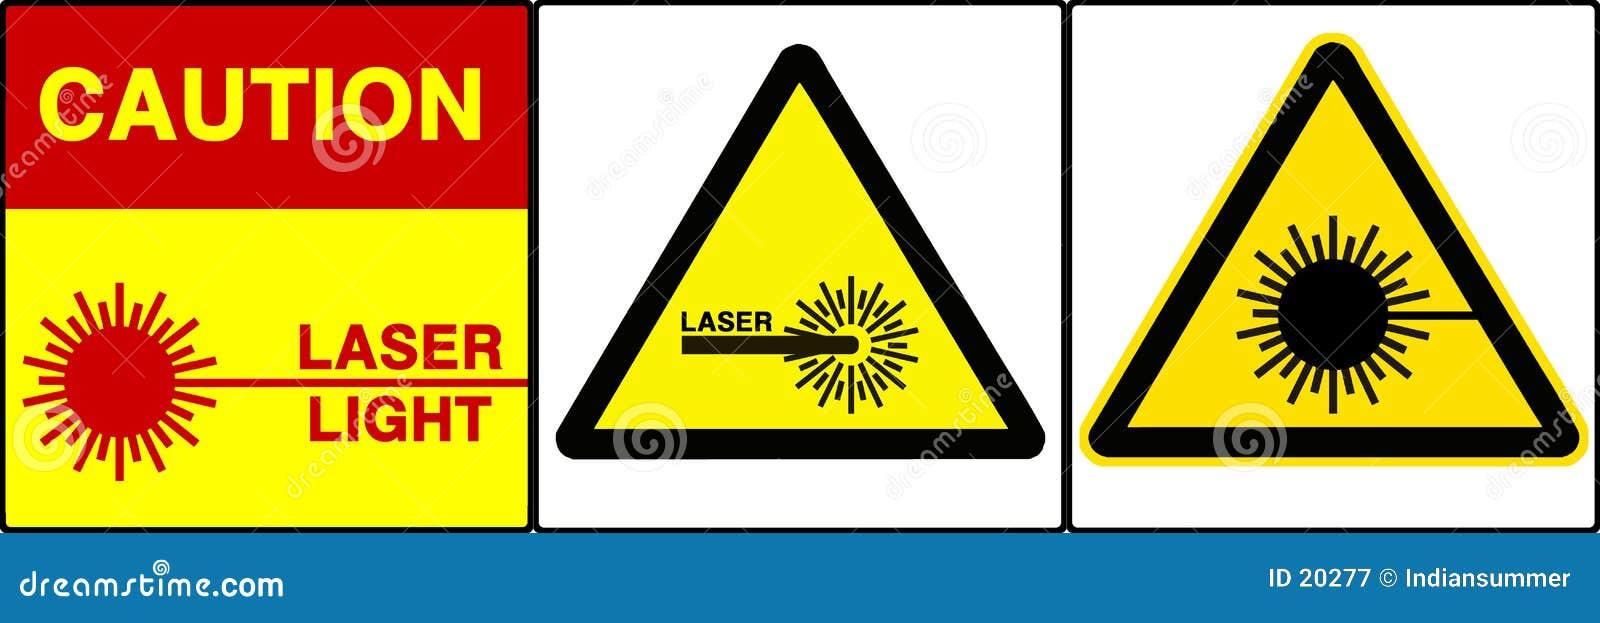 Caution/warning signs set, VII